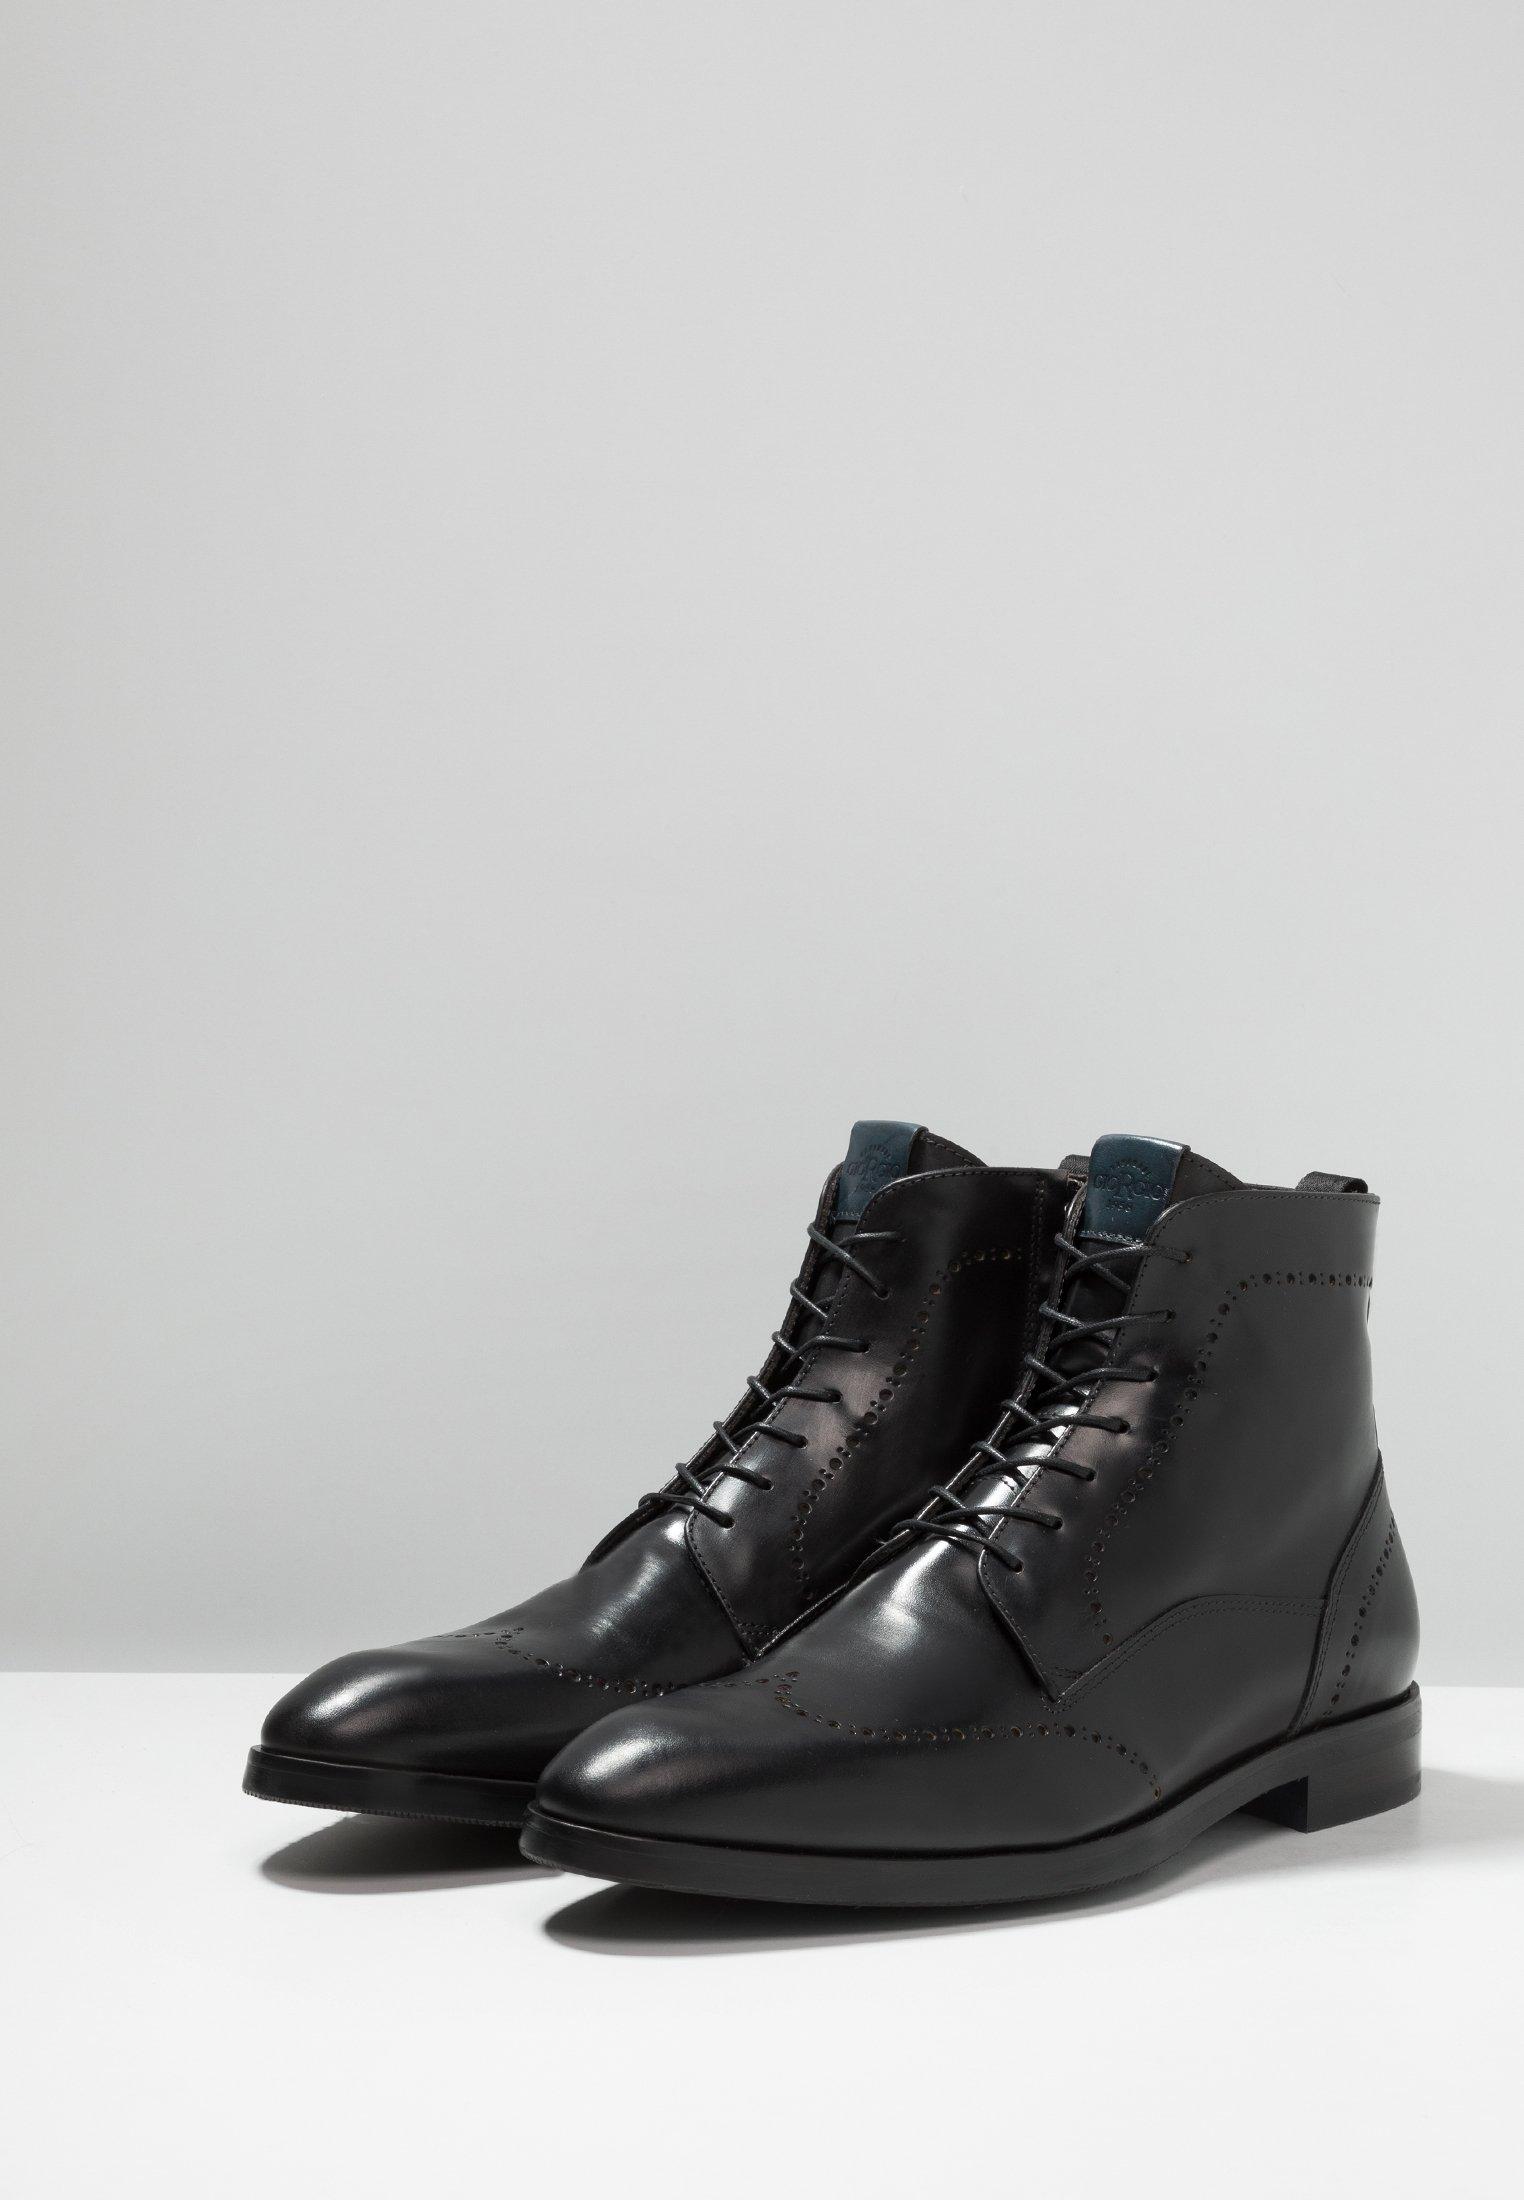 2013 Cheapest Giorgio 1958 Lace-up ankle boots - black   men's shoes 2020 FXrKx